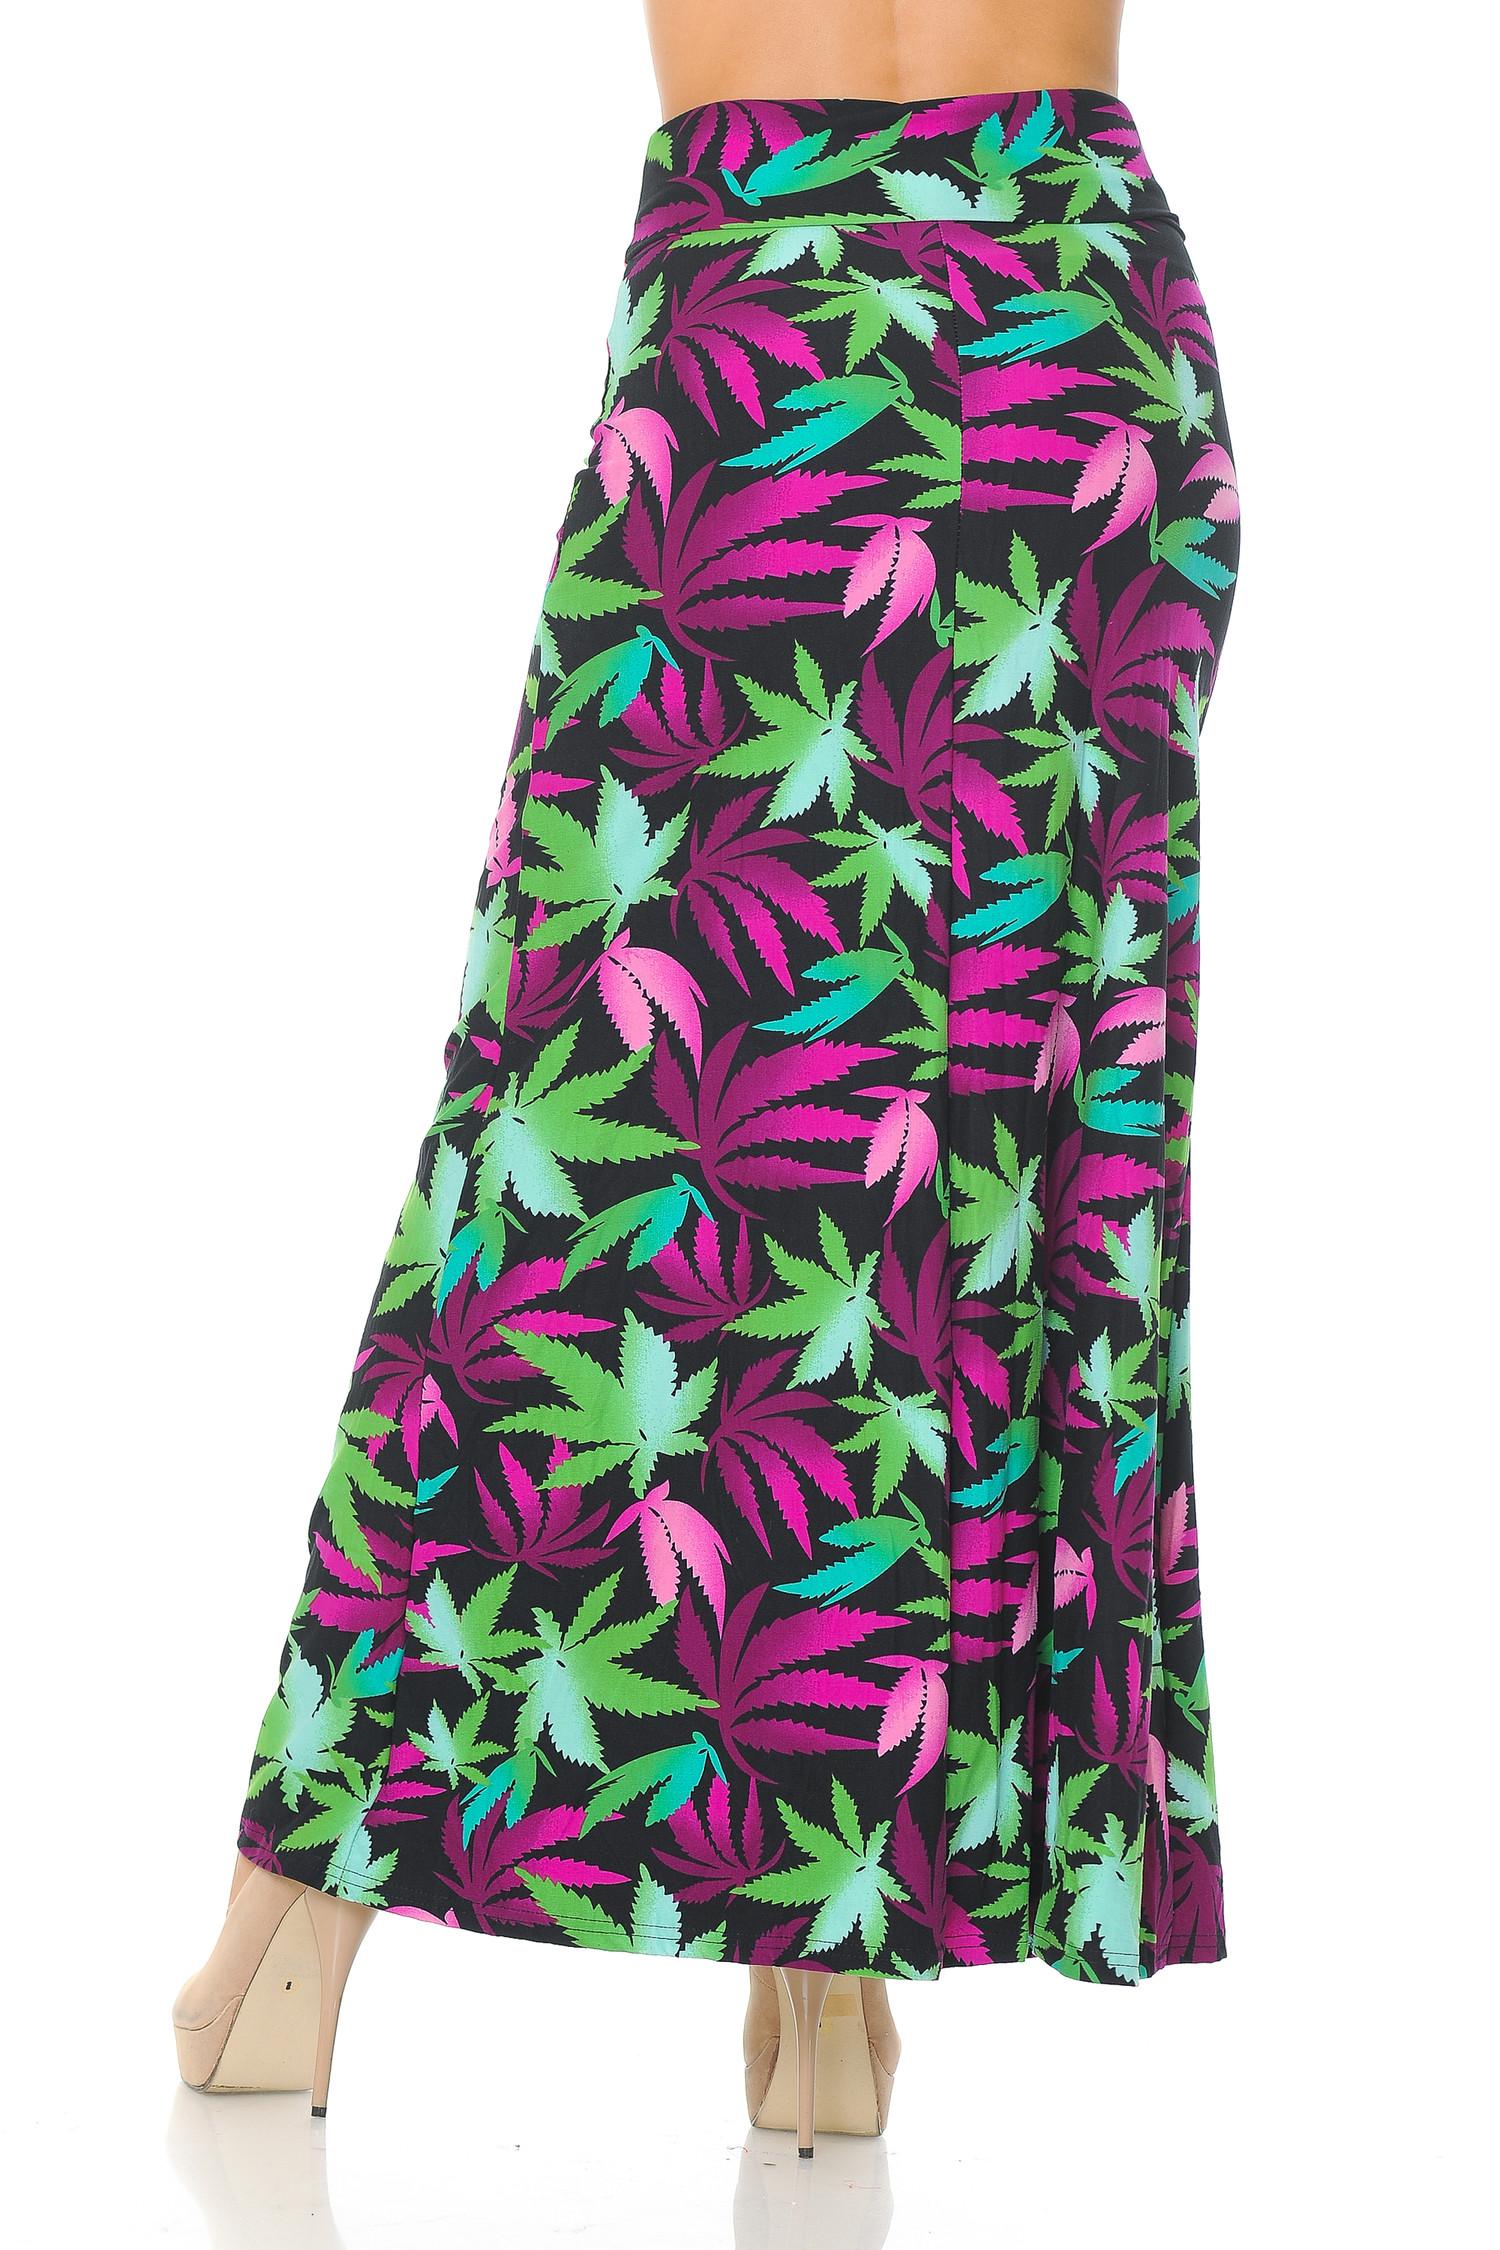 Brushed Fuchsia Marijuana Maxi Skirt